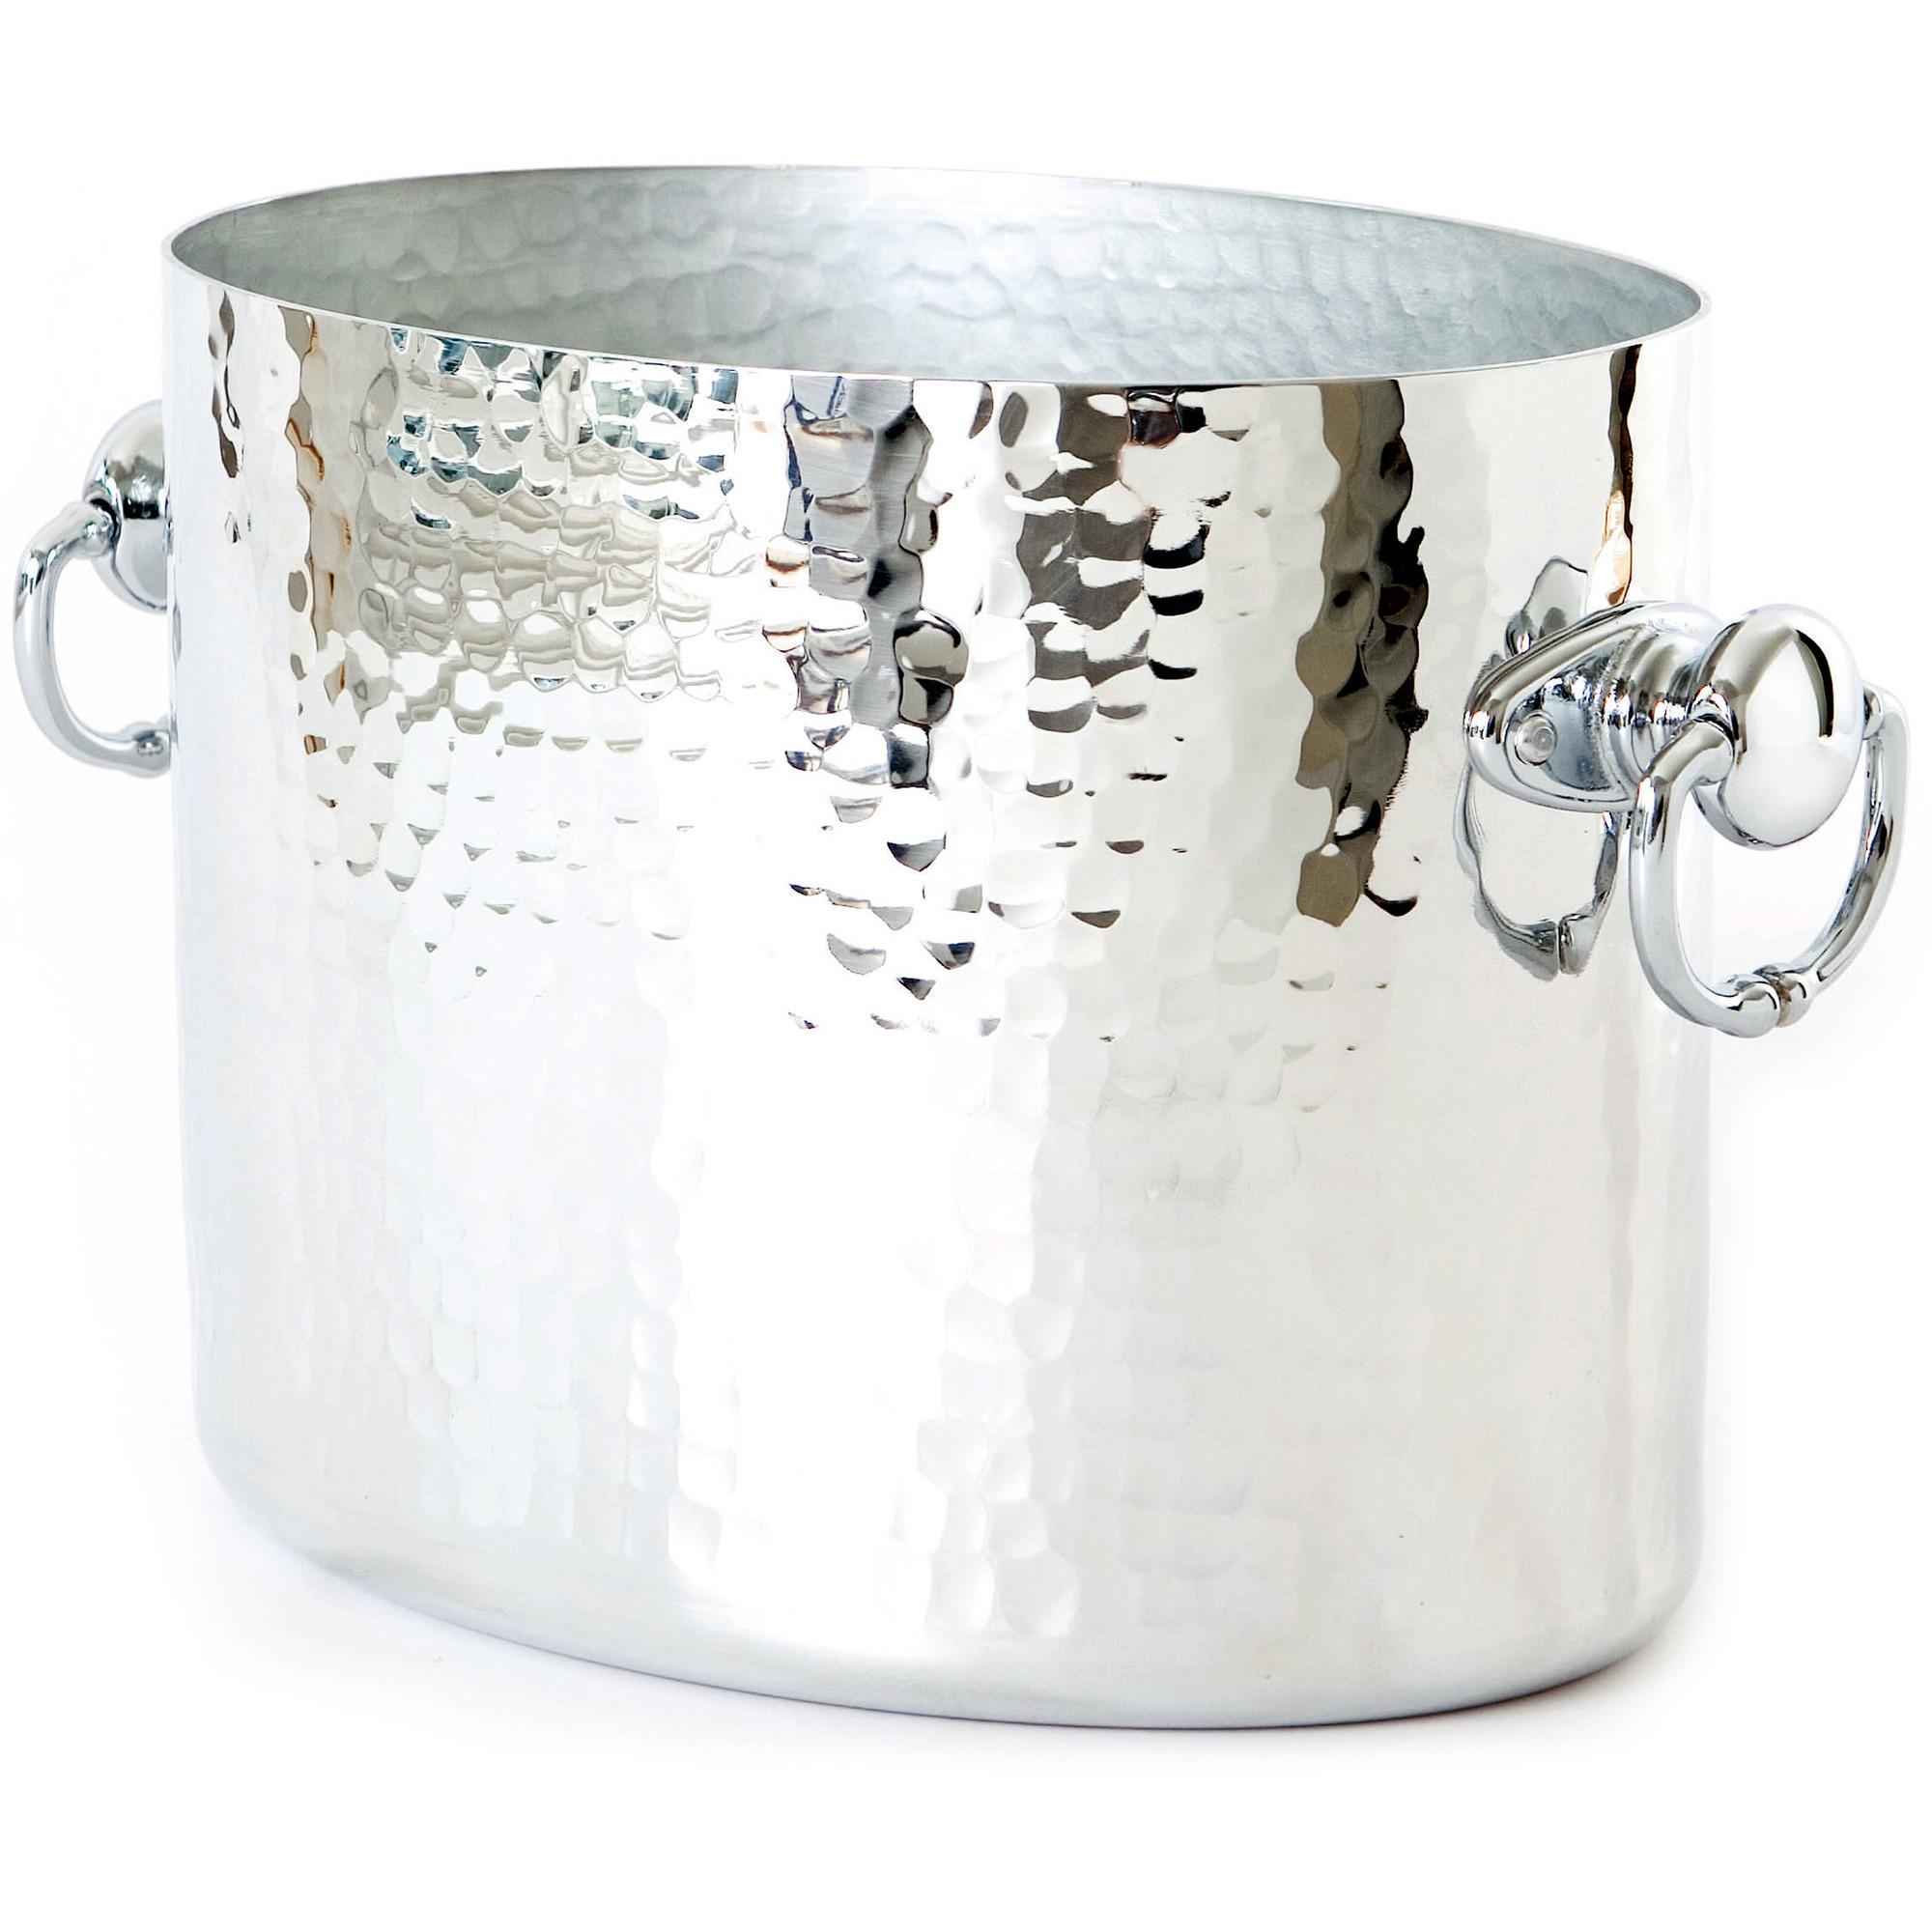 Mauviel Oval champagnekylare i aluminium